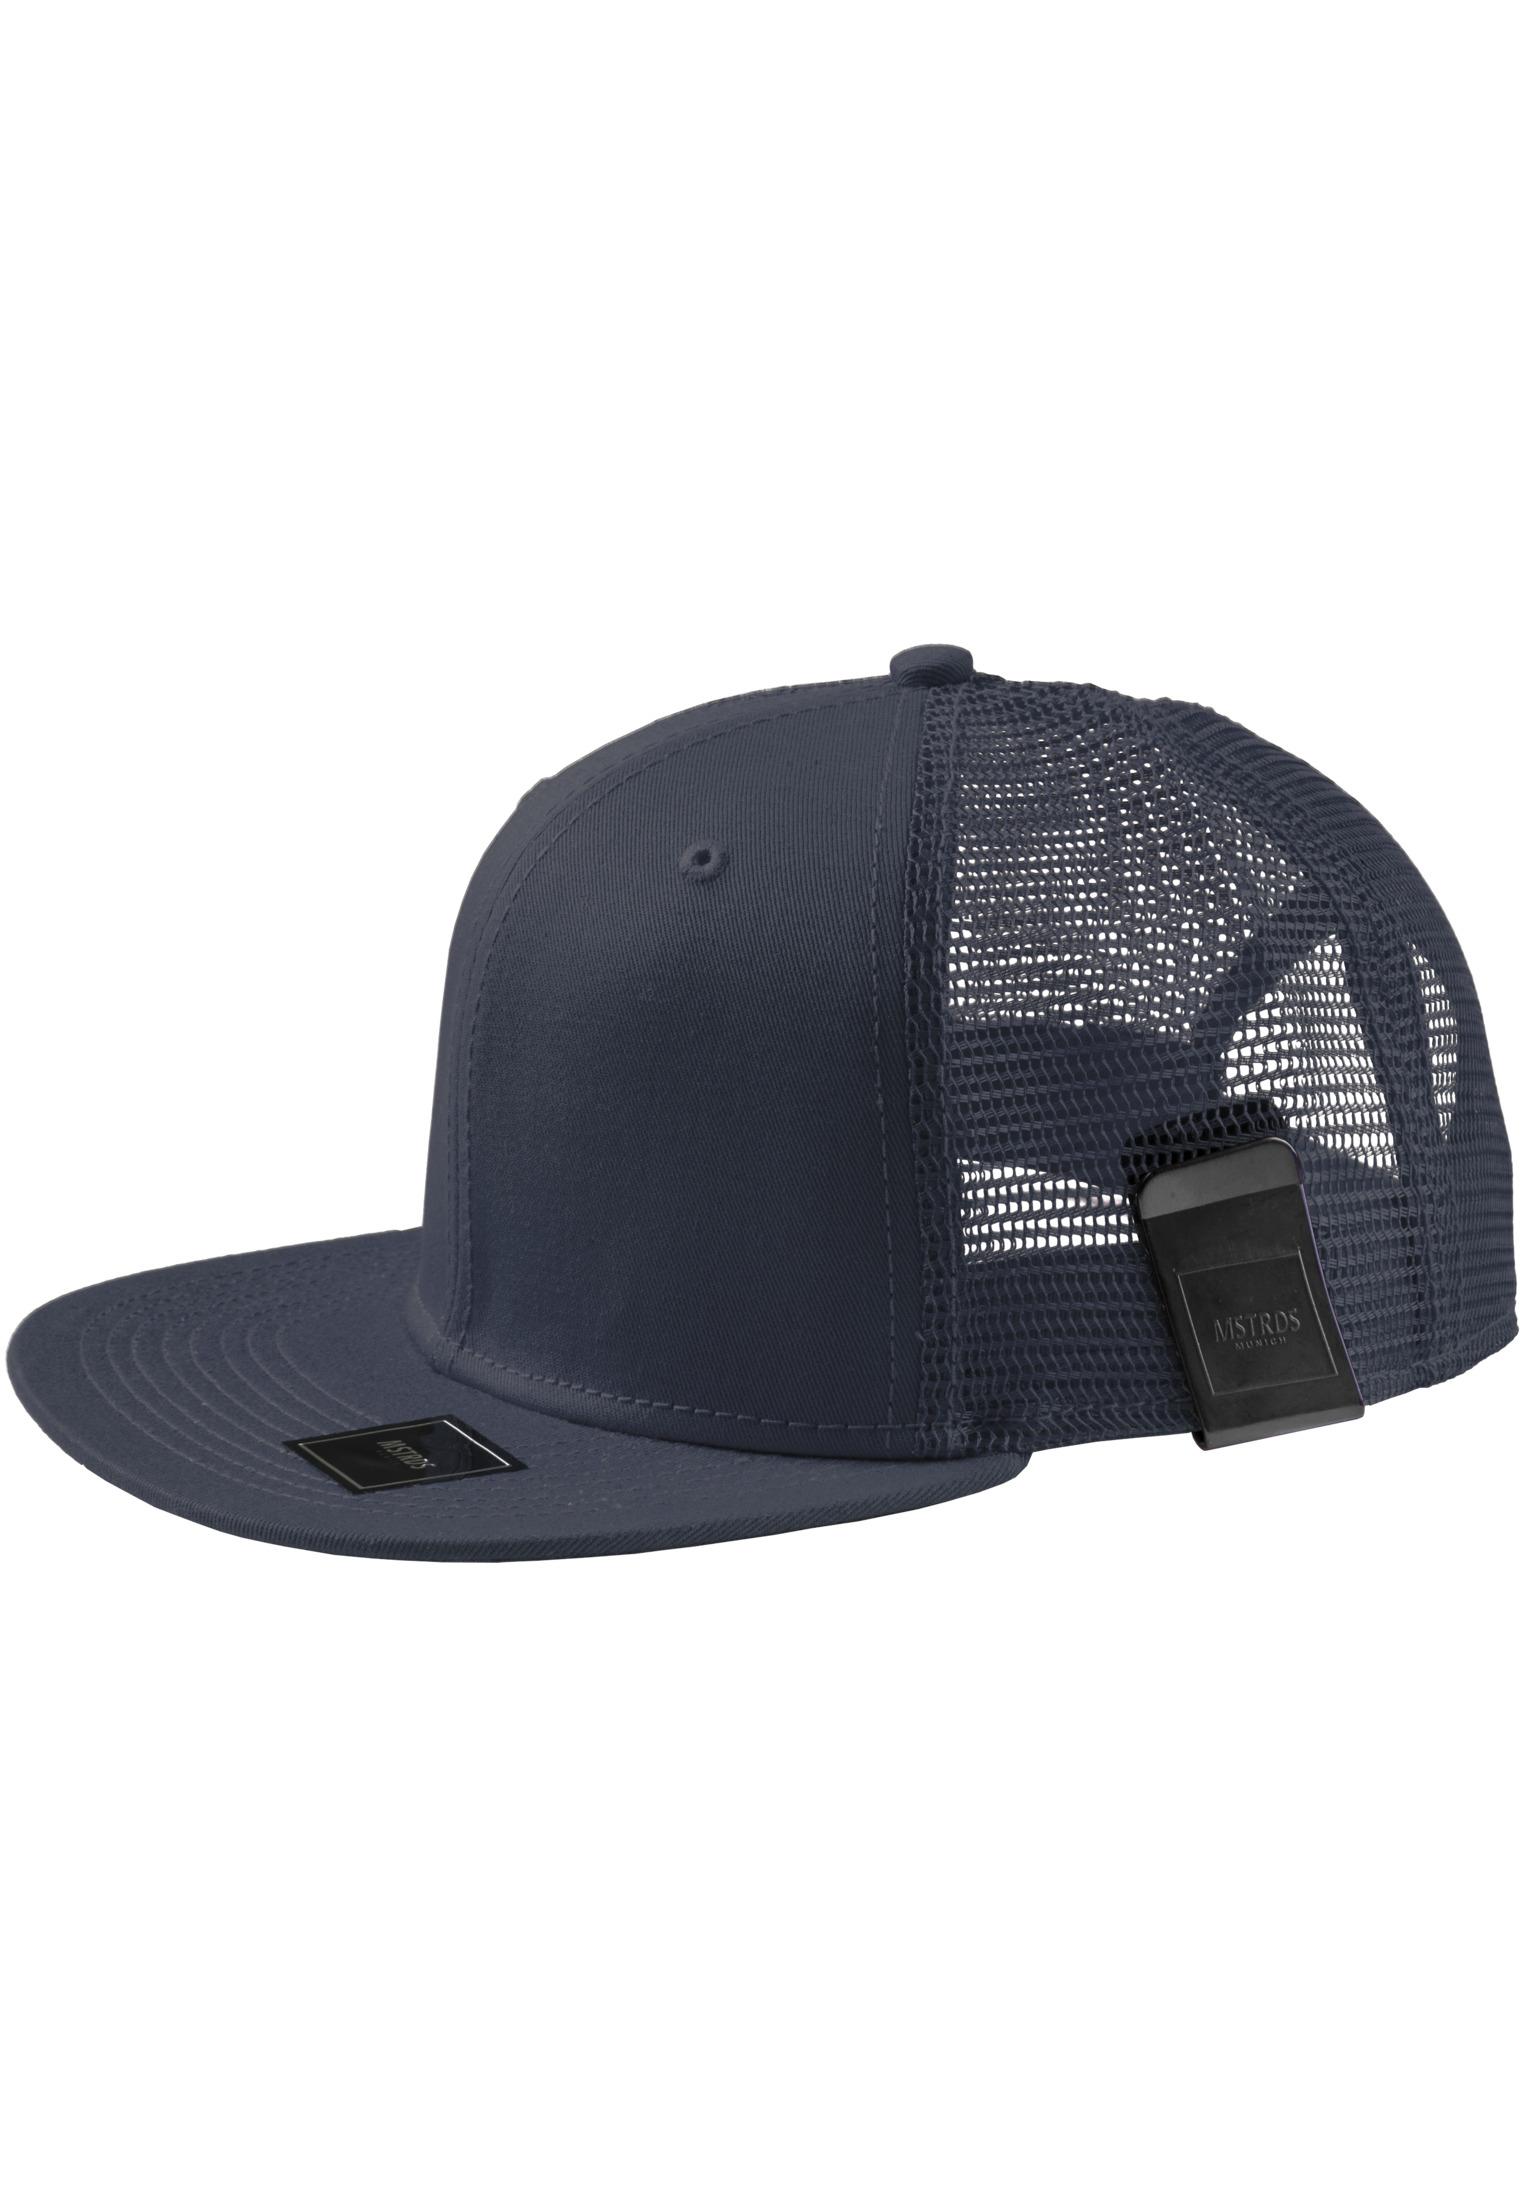 Master Dis MoneyClip Trucker Snapback Cap dark navy - One Size